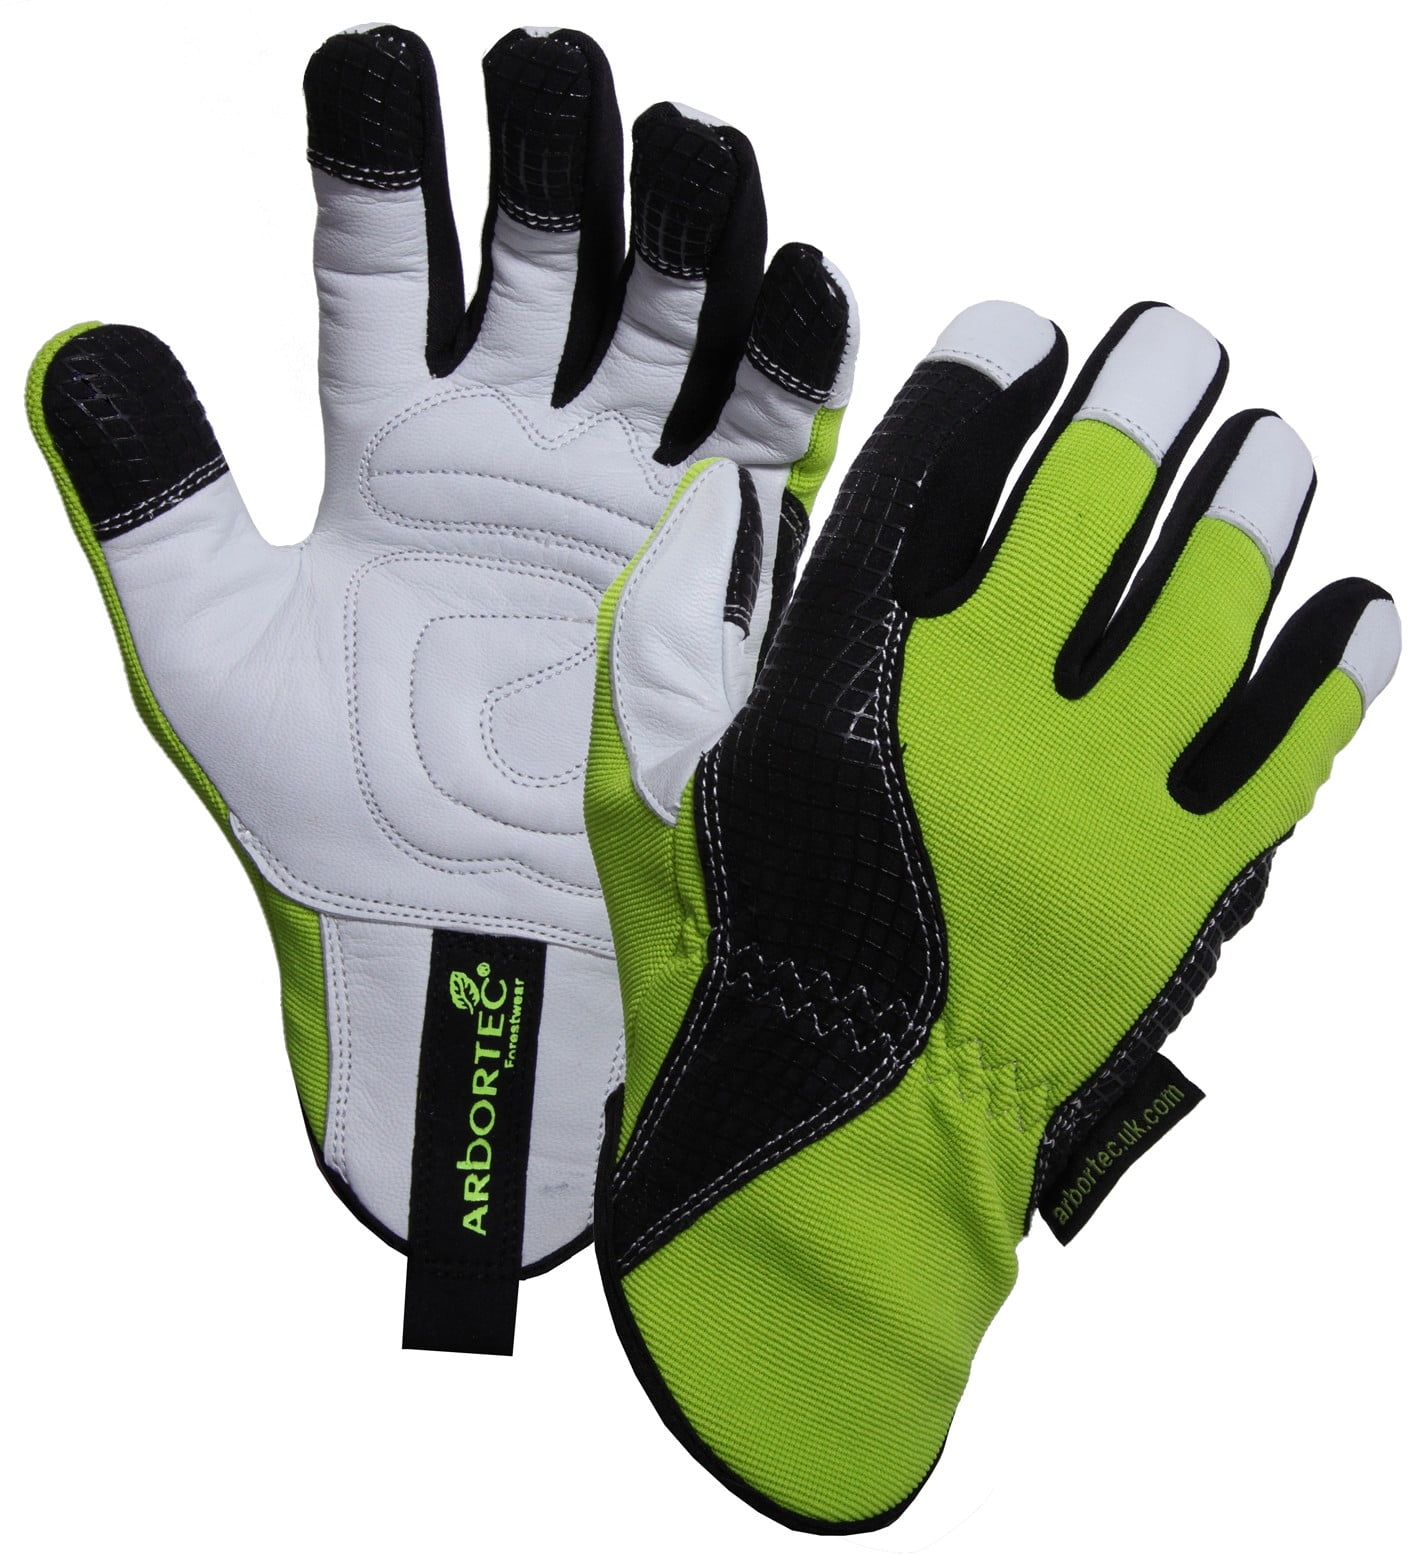 Arbortec Pro 1550 Climbers Chainsaw Gloves